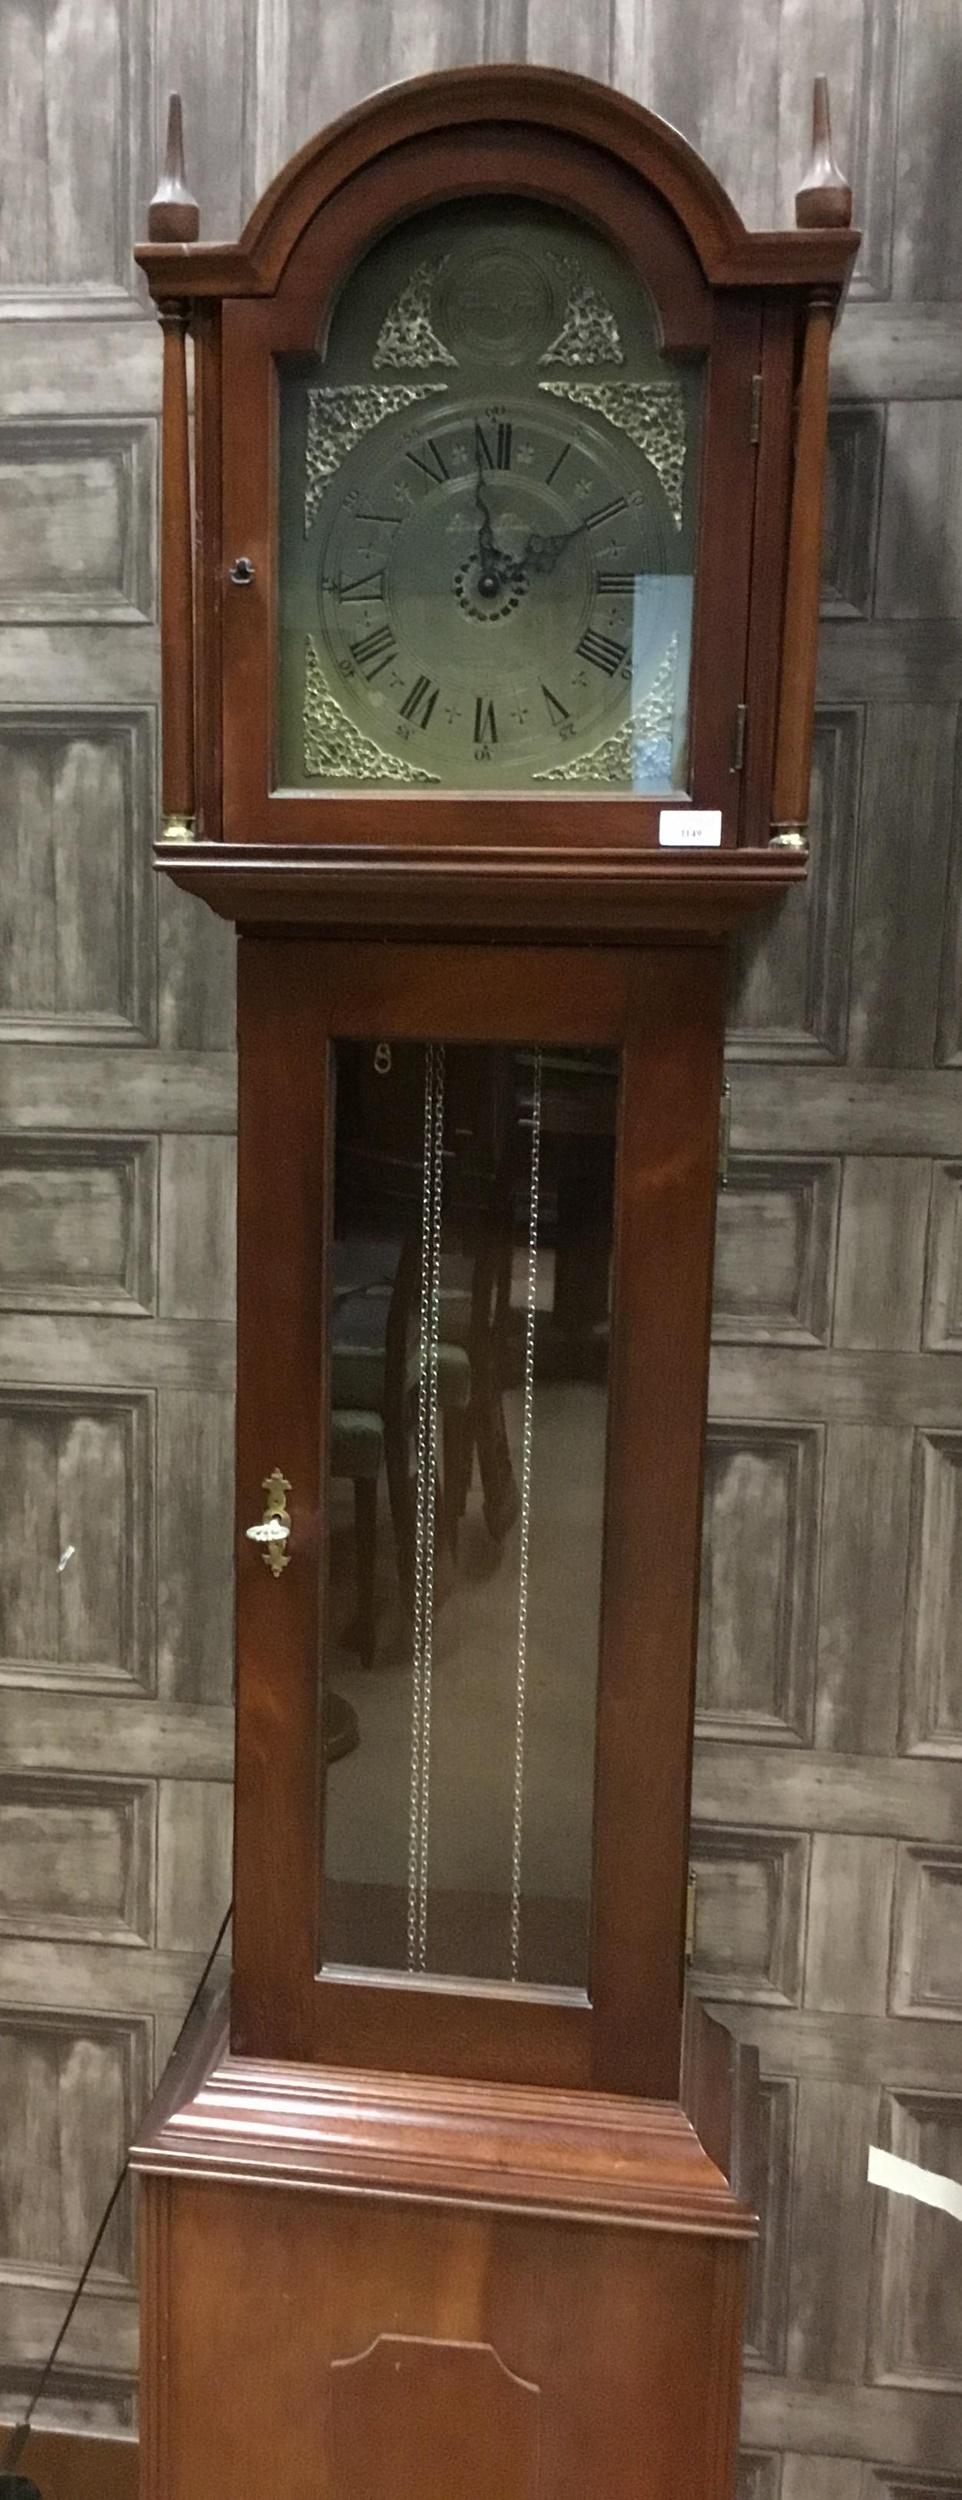 Lot 1149 - A MAHOGANY LONGCASE CLOCK BY RICHARD BROAD